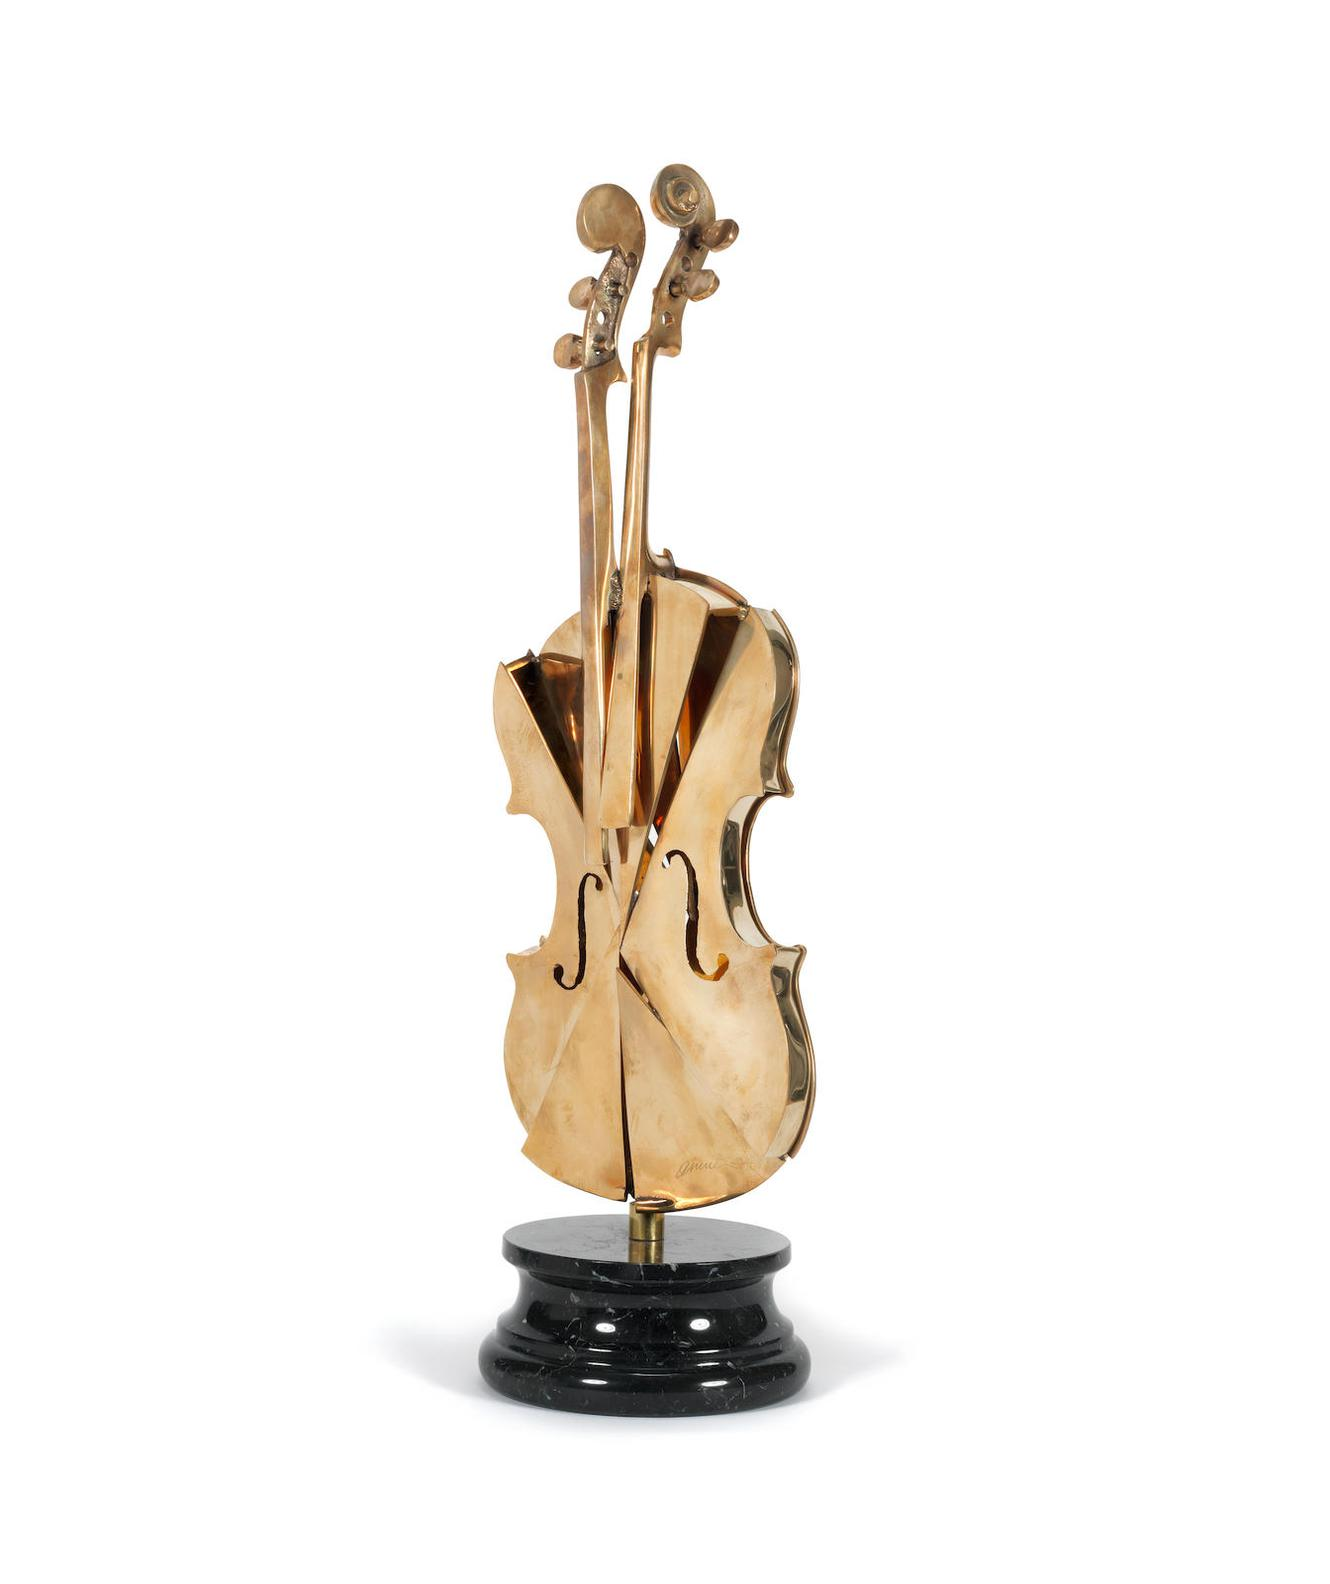 Arman-Untitled (Violin)-2004